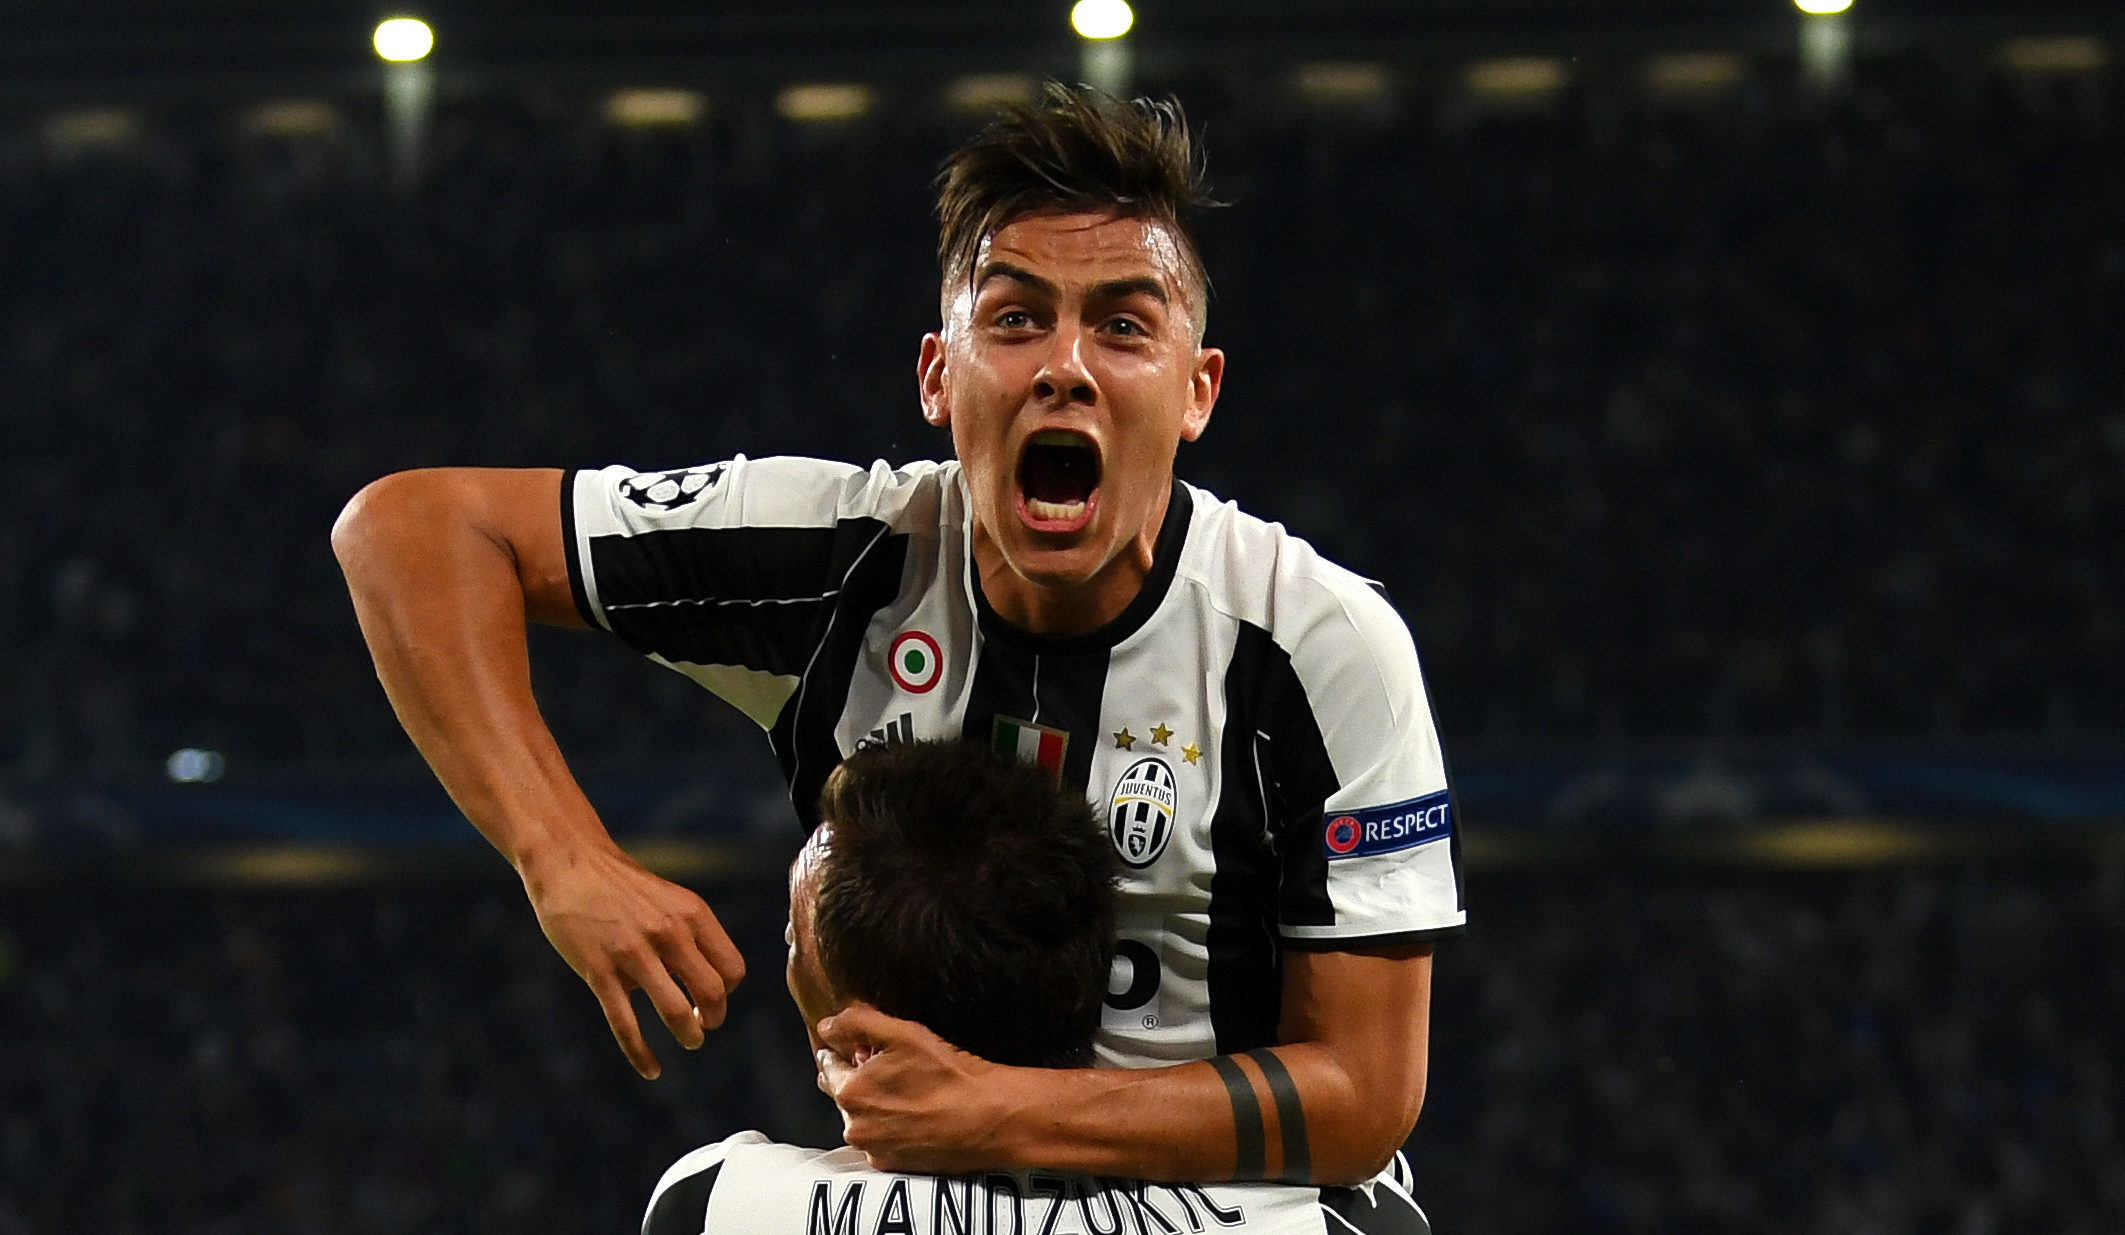 Paulo Dybala of Juventus (Mike Hewitt/Getty Images)